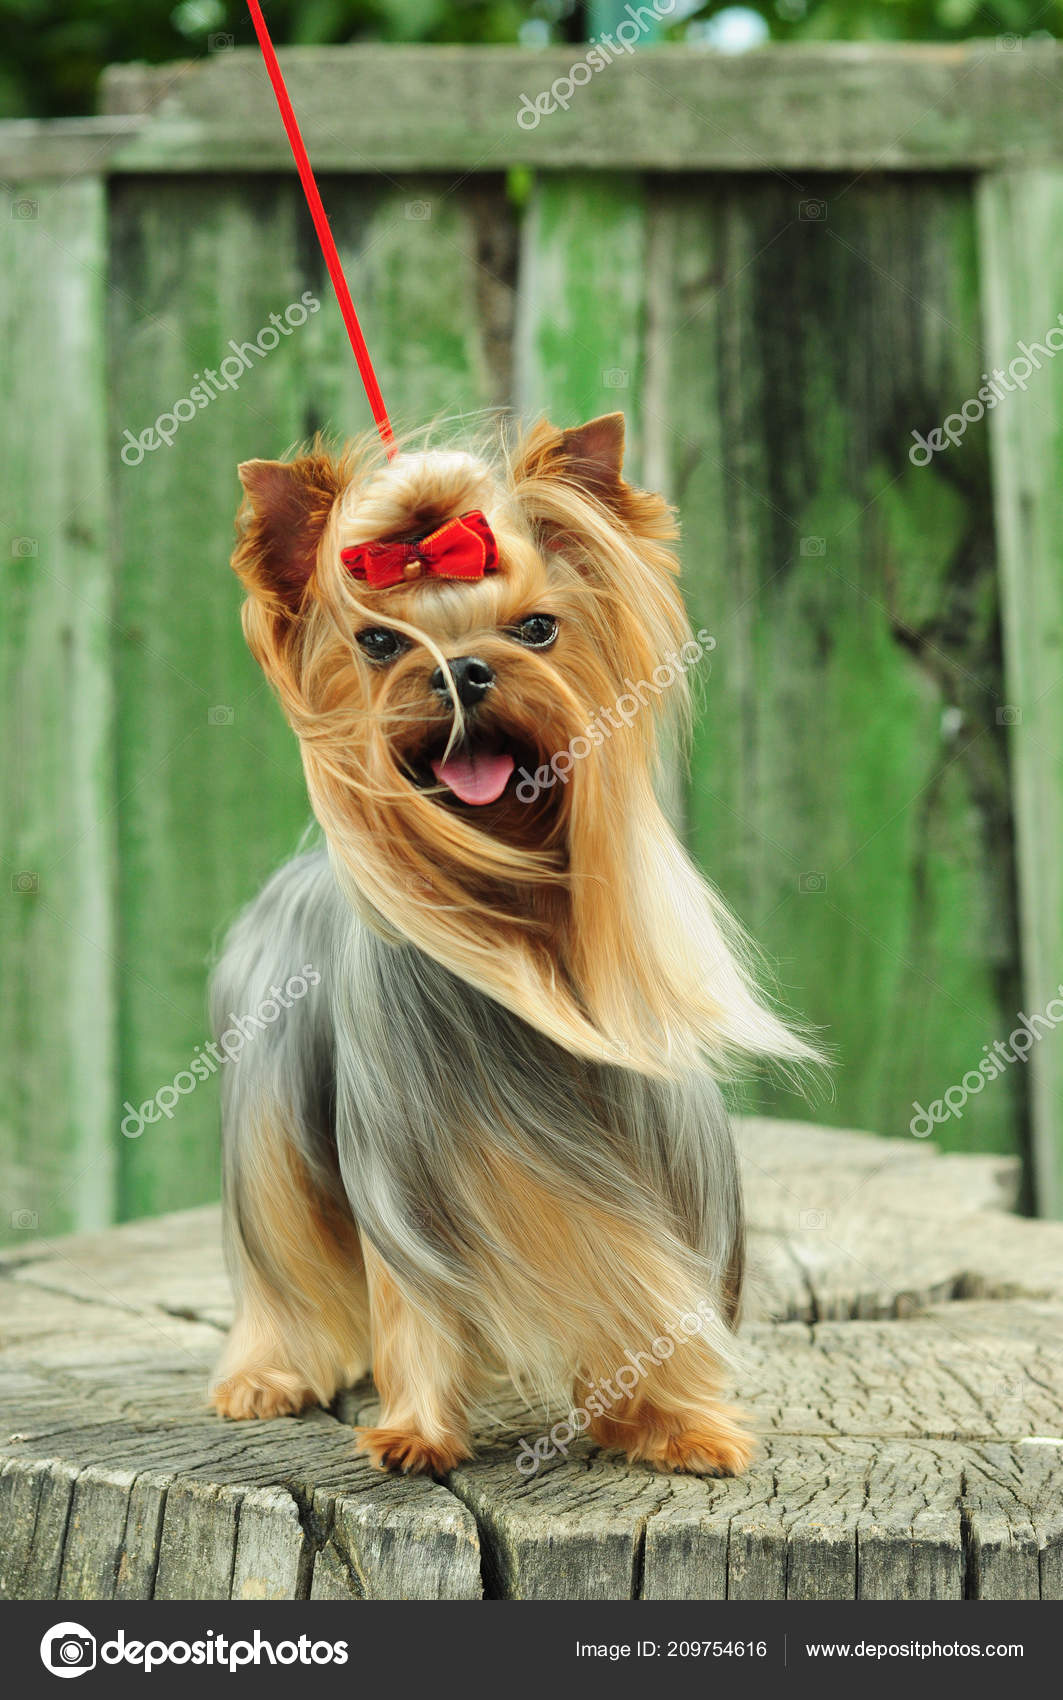 Pics Yorkie Dog Beautiful Yorkshire Terrier Stump Dog